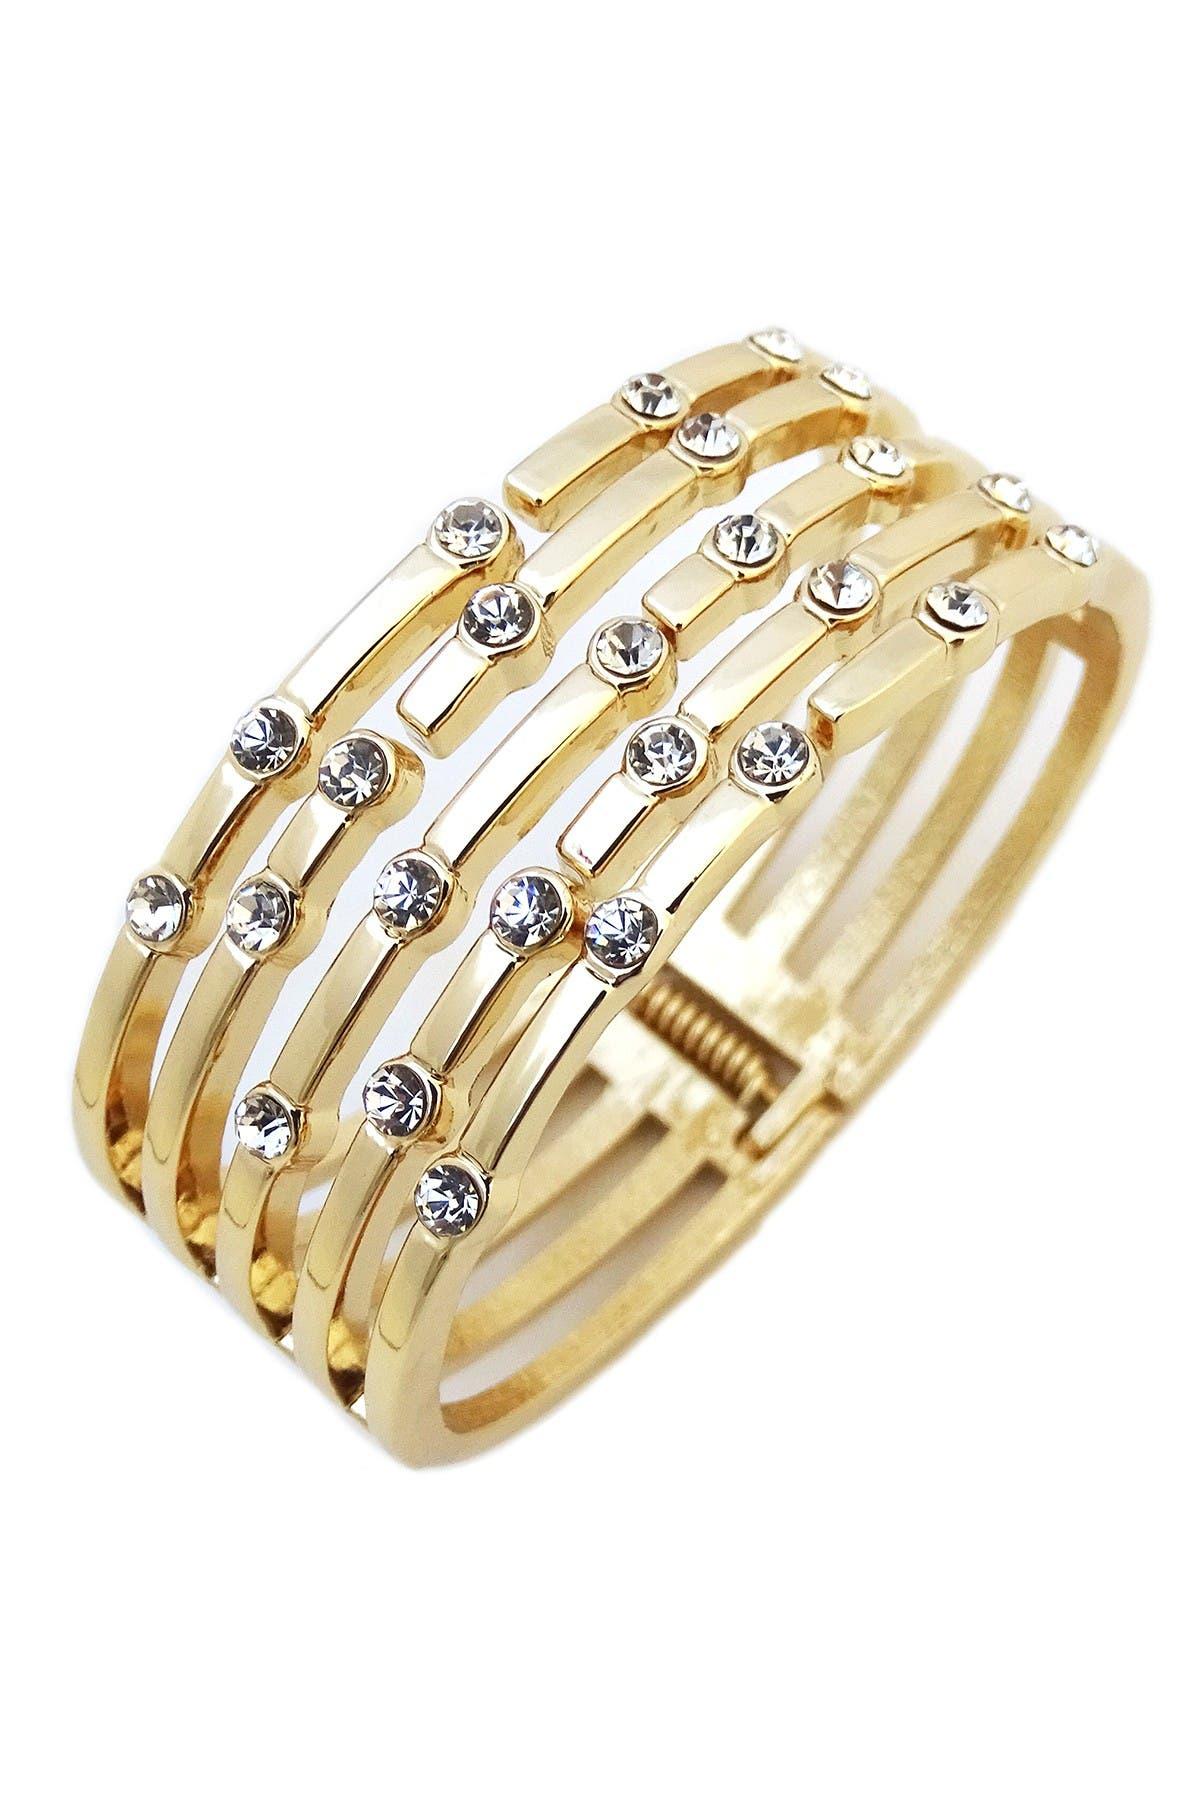 Image of Savvy Cie 18K Yellow Gold Plated Bezel Set CZ Hinged Cuff Bracelet